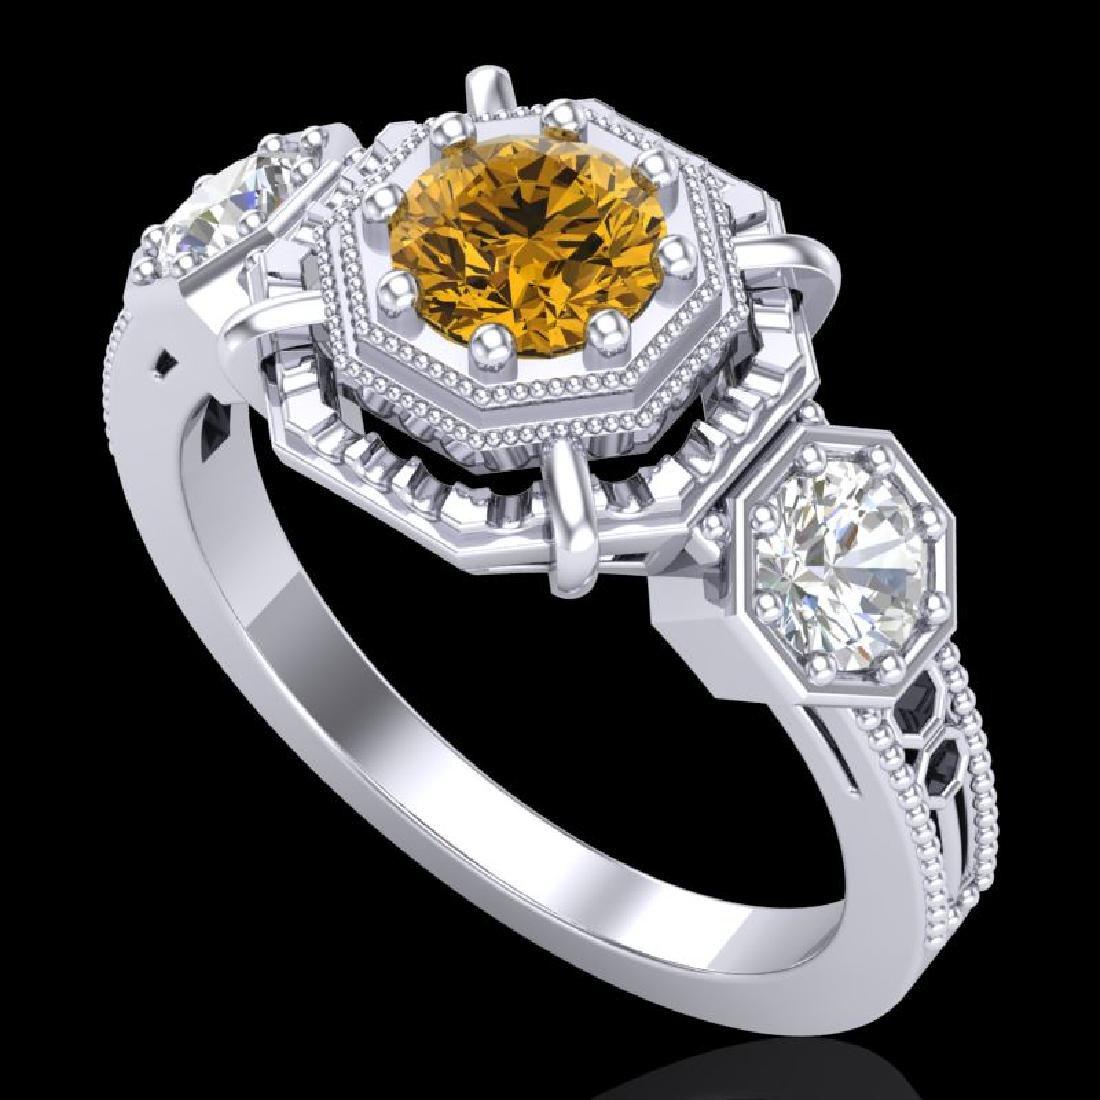 1.01 CTW Intense Fancy Yellow Diamond Art Deco 3 Stone